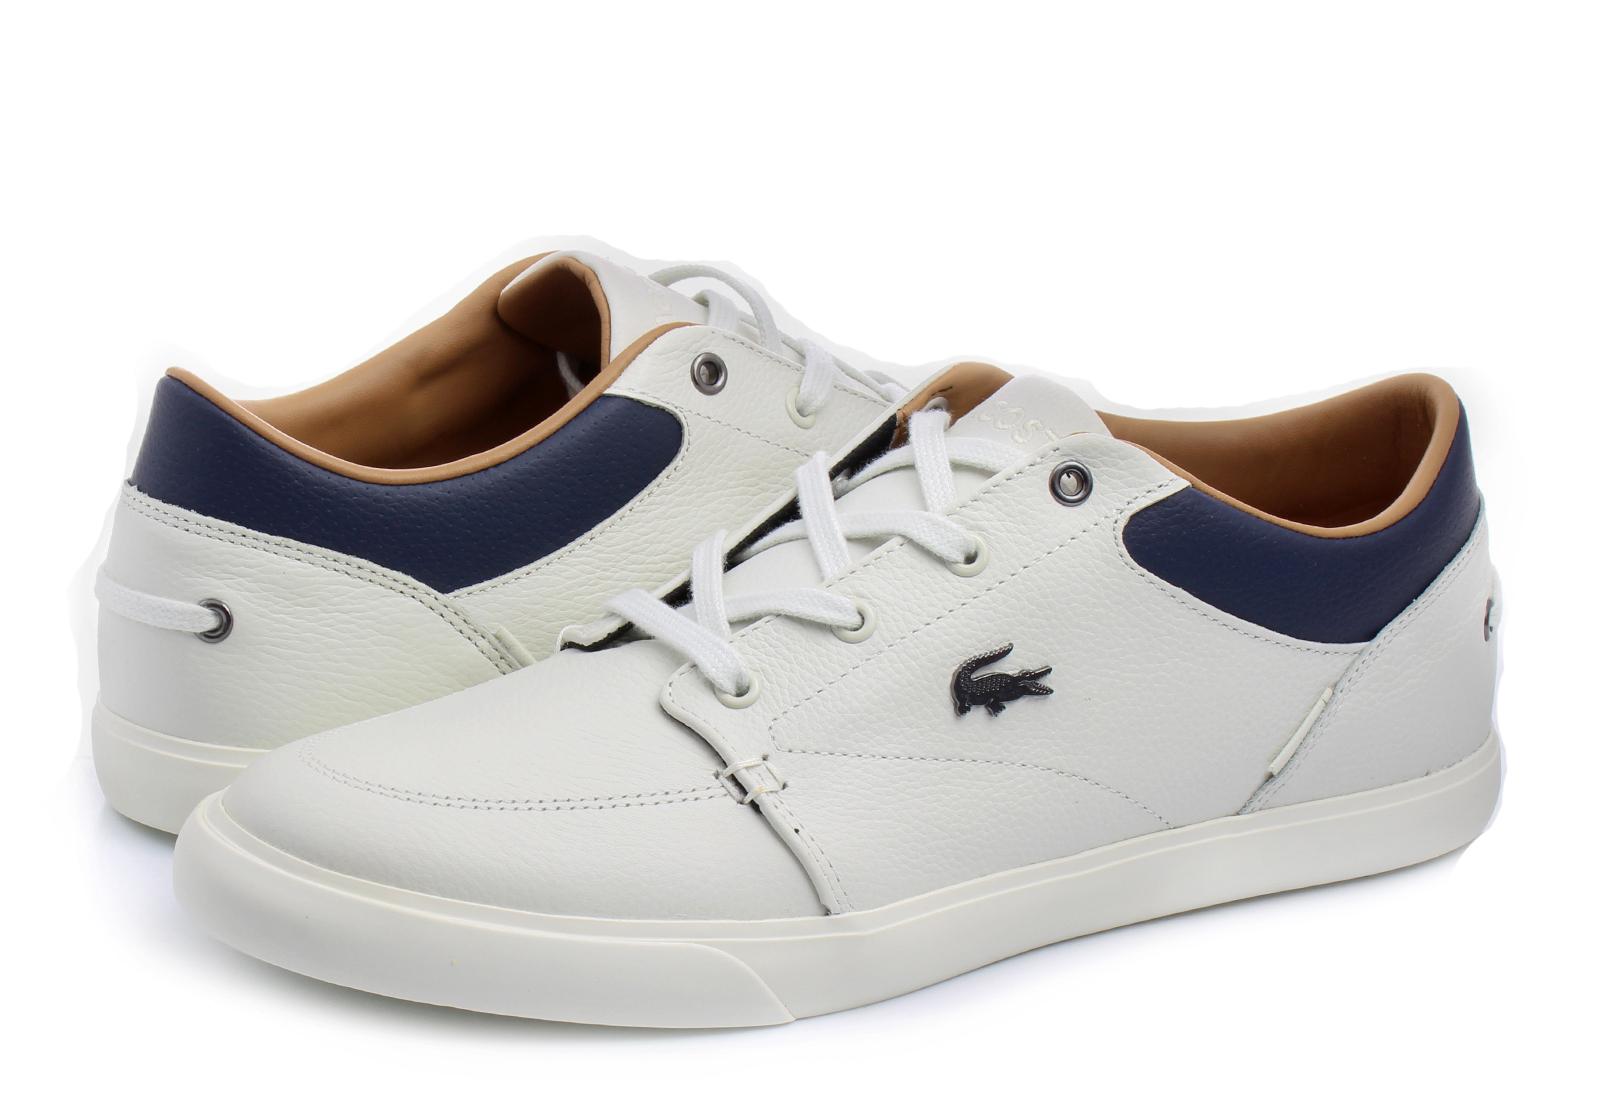 79a6a65c0 Lacoste Shoes - Bayliss 118 1 - 181cam0006-wn1 - Online shop for ...